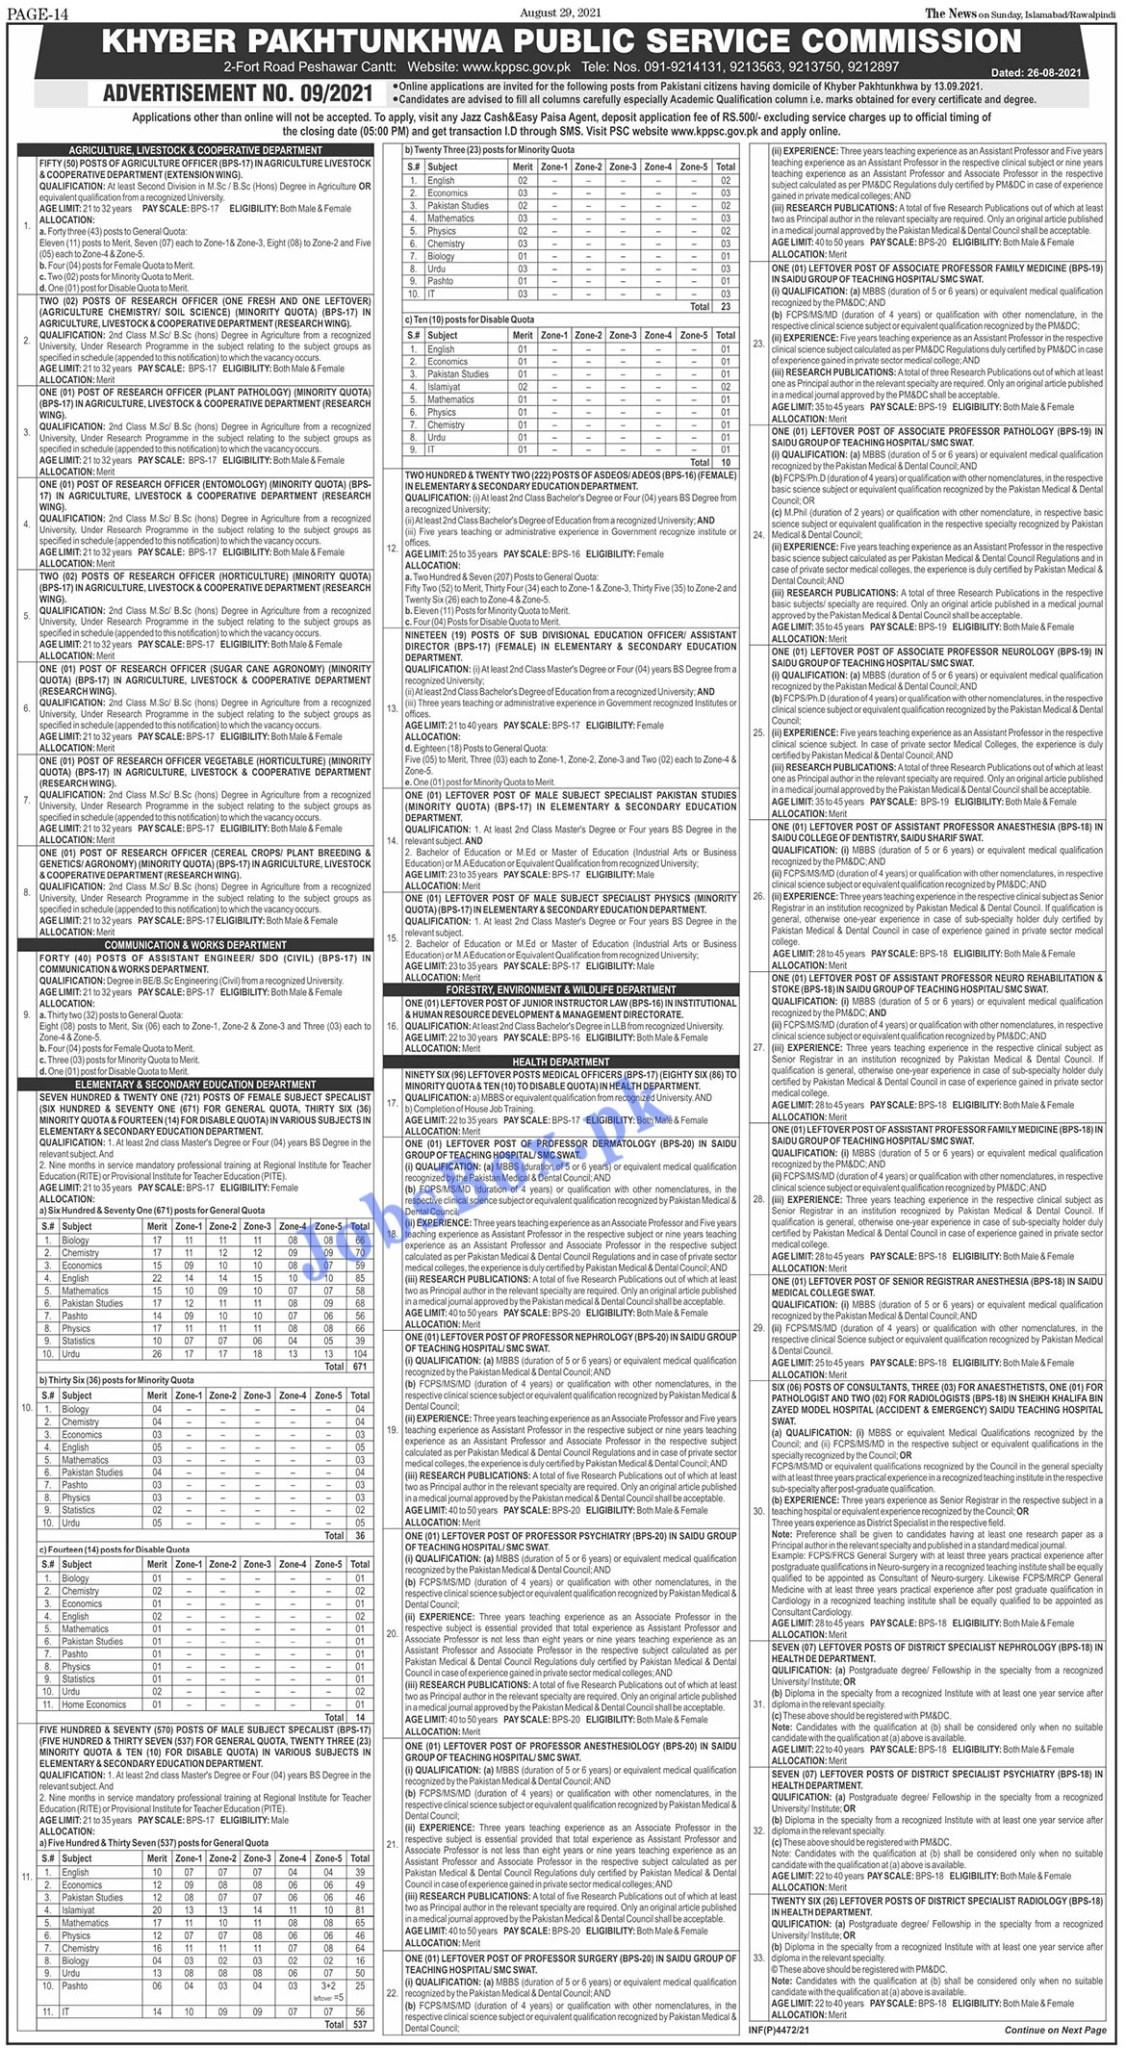 KPPSC Jobs 2021 Advertisement No. 09 – KPPSC Educators Jobs